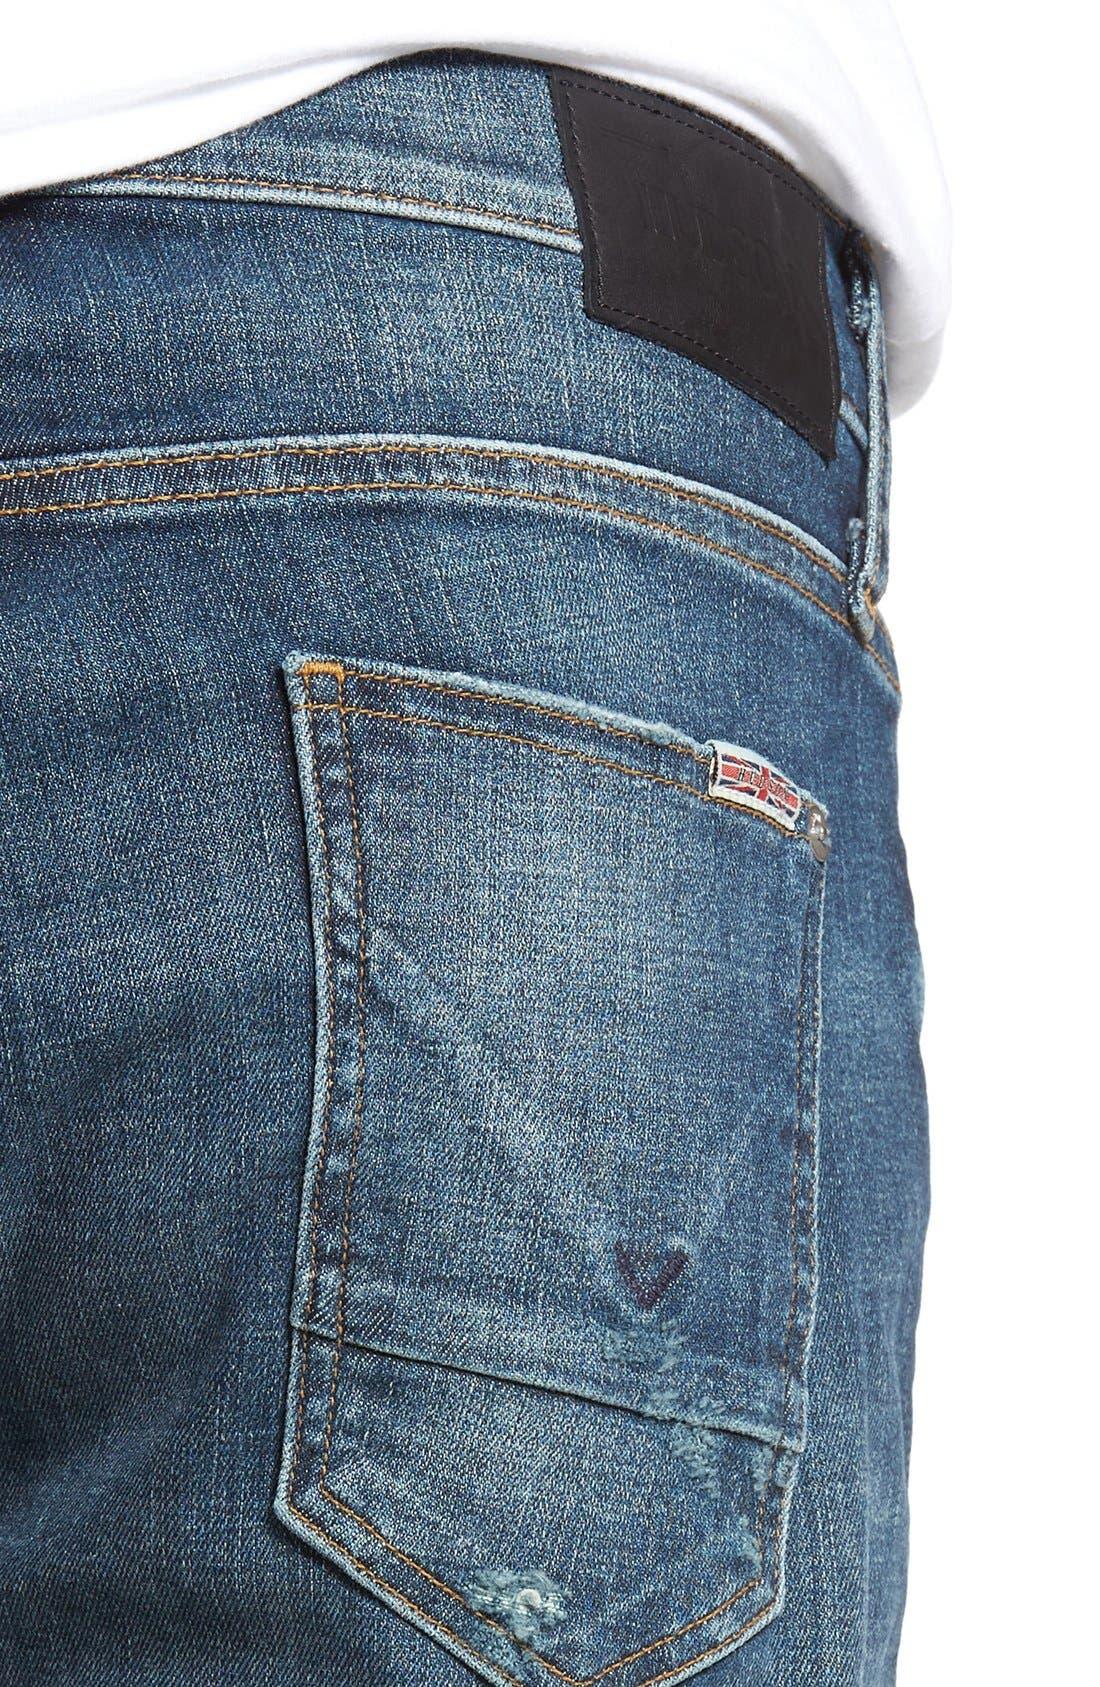 Alternate Image 4  - Hudson Jeans Sartor Slouchy Skinny Fit Jeans (Deserter)